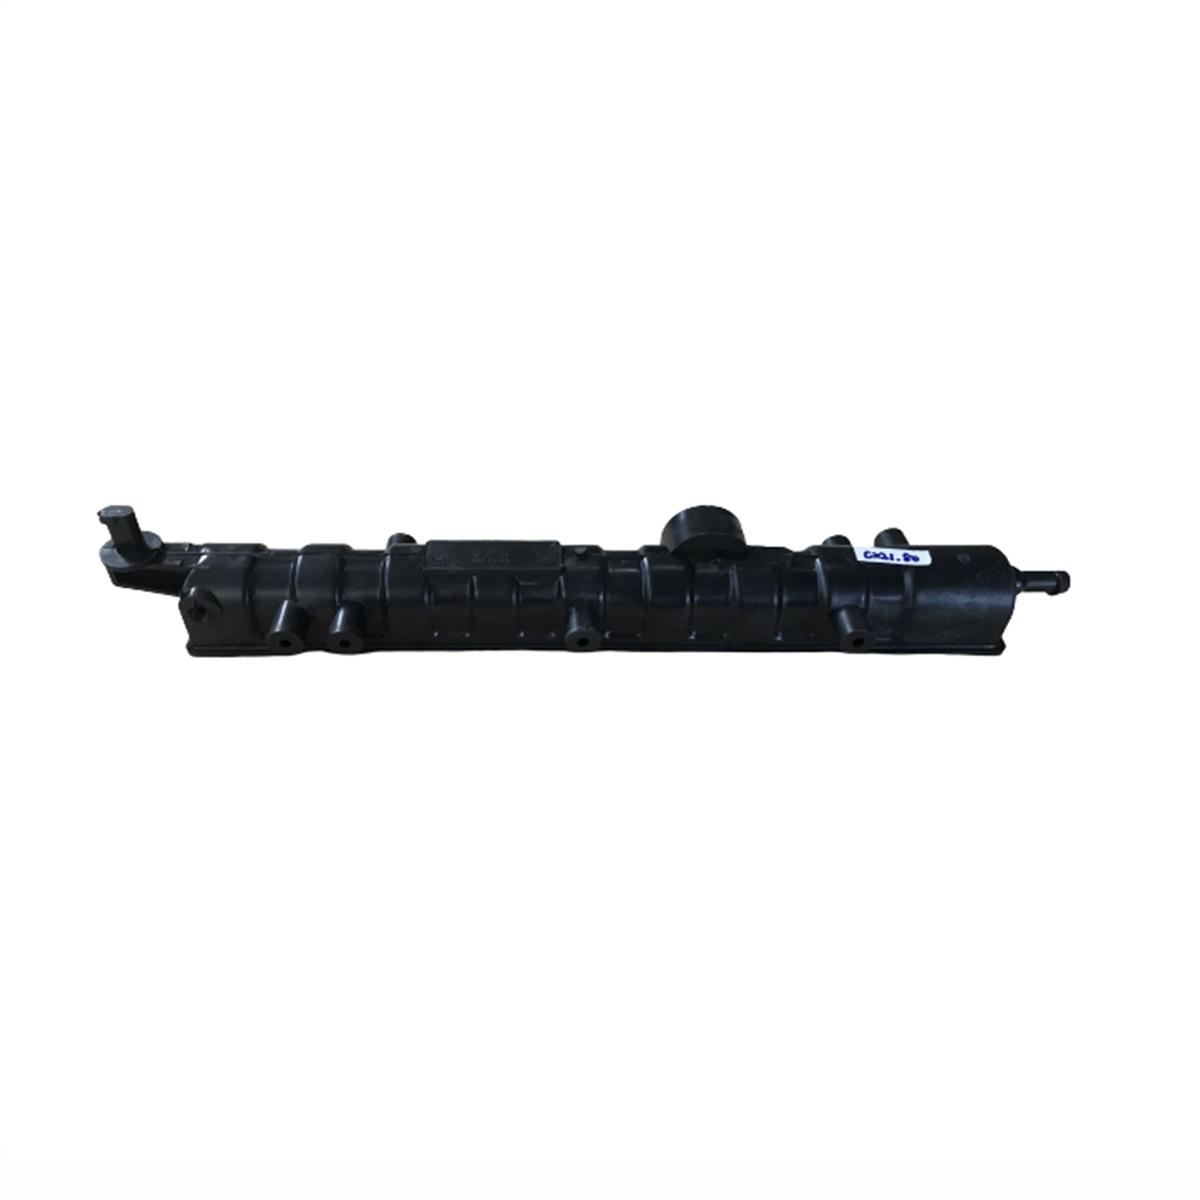 Caixa de Radiador Inferior Fiat Palio 1.5 46mm x 360mm